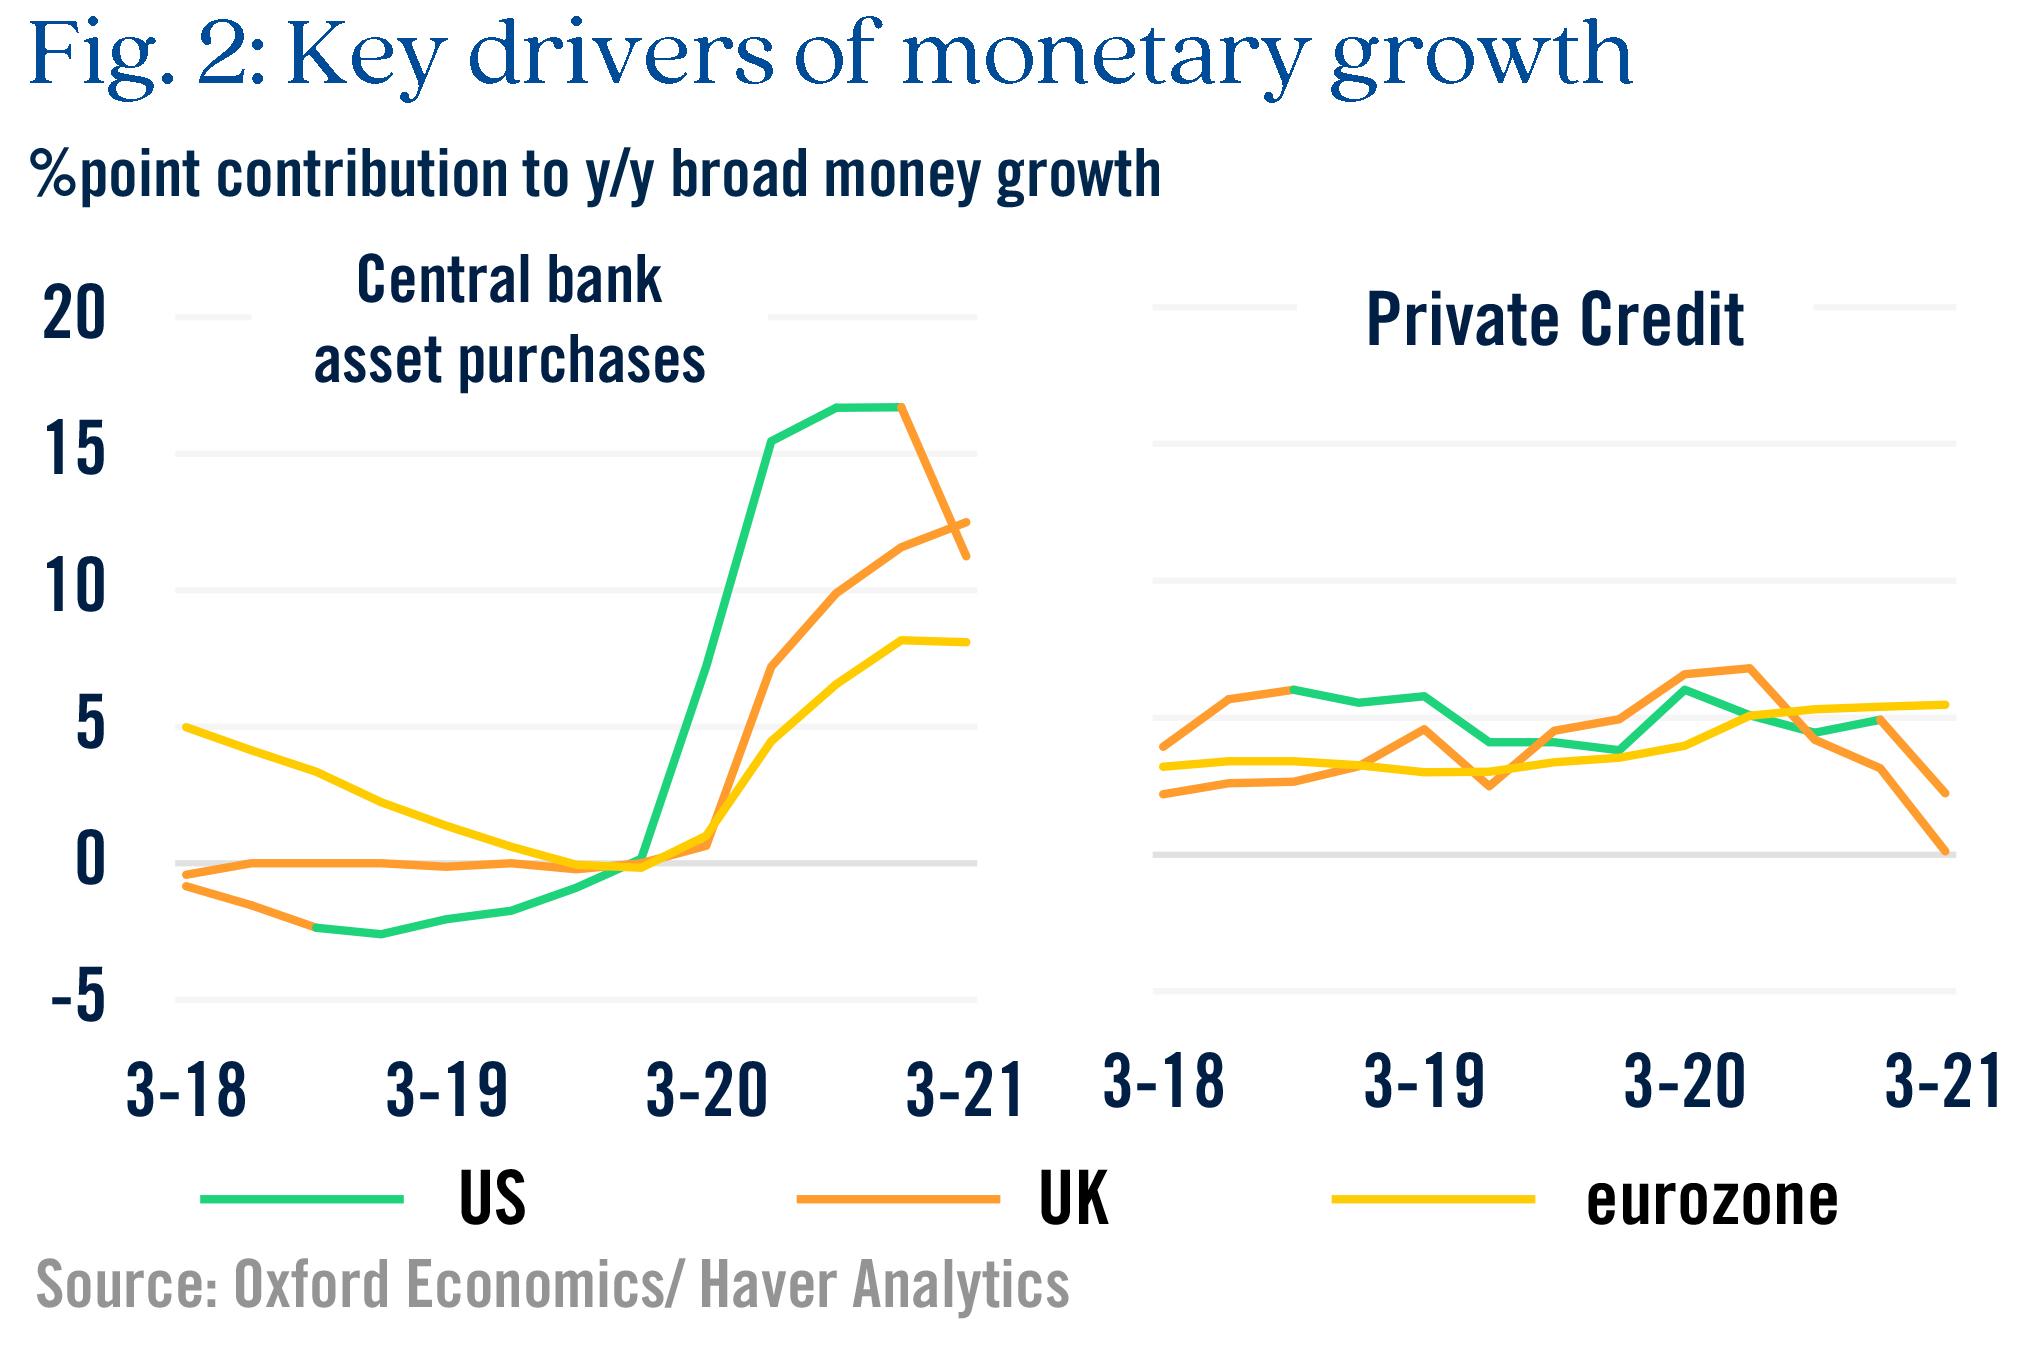 Figure 2 Key drivers of monetary growth